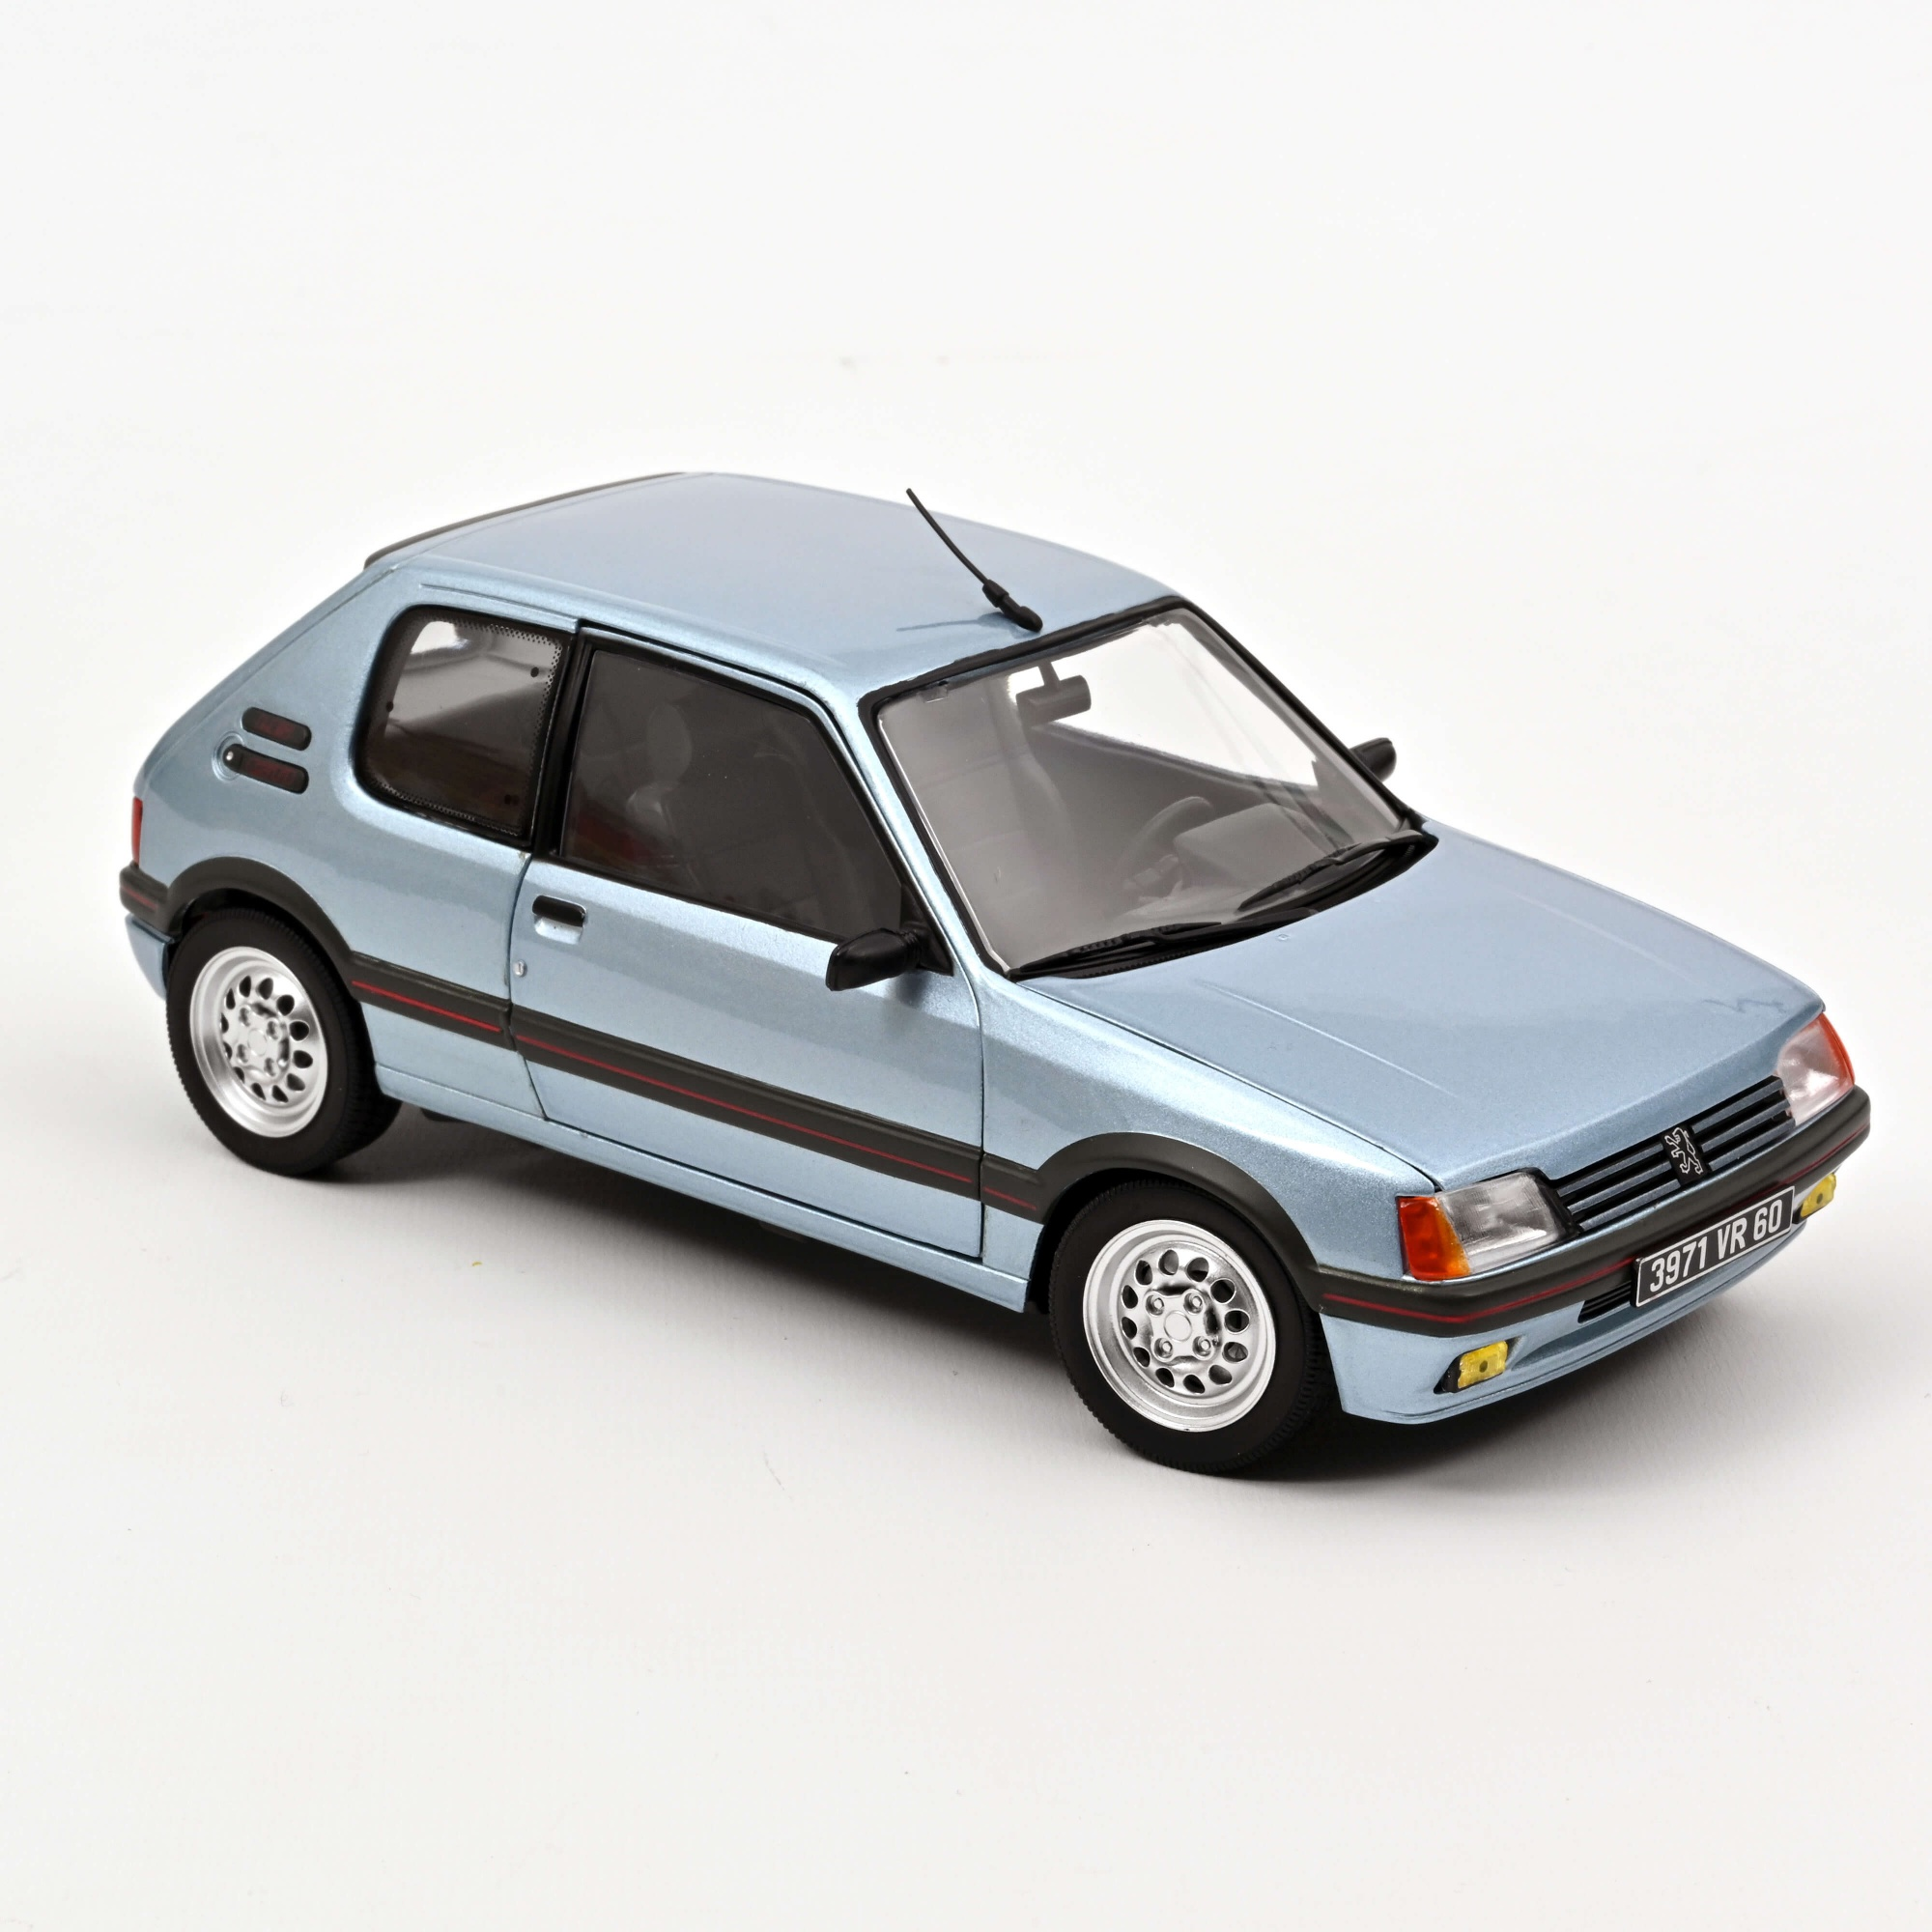 Peugeot 205 GTi 1.6 1988 Topaze Blue